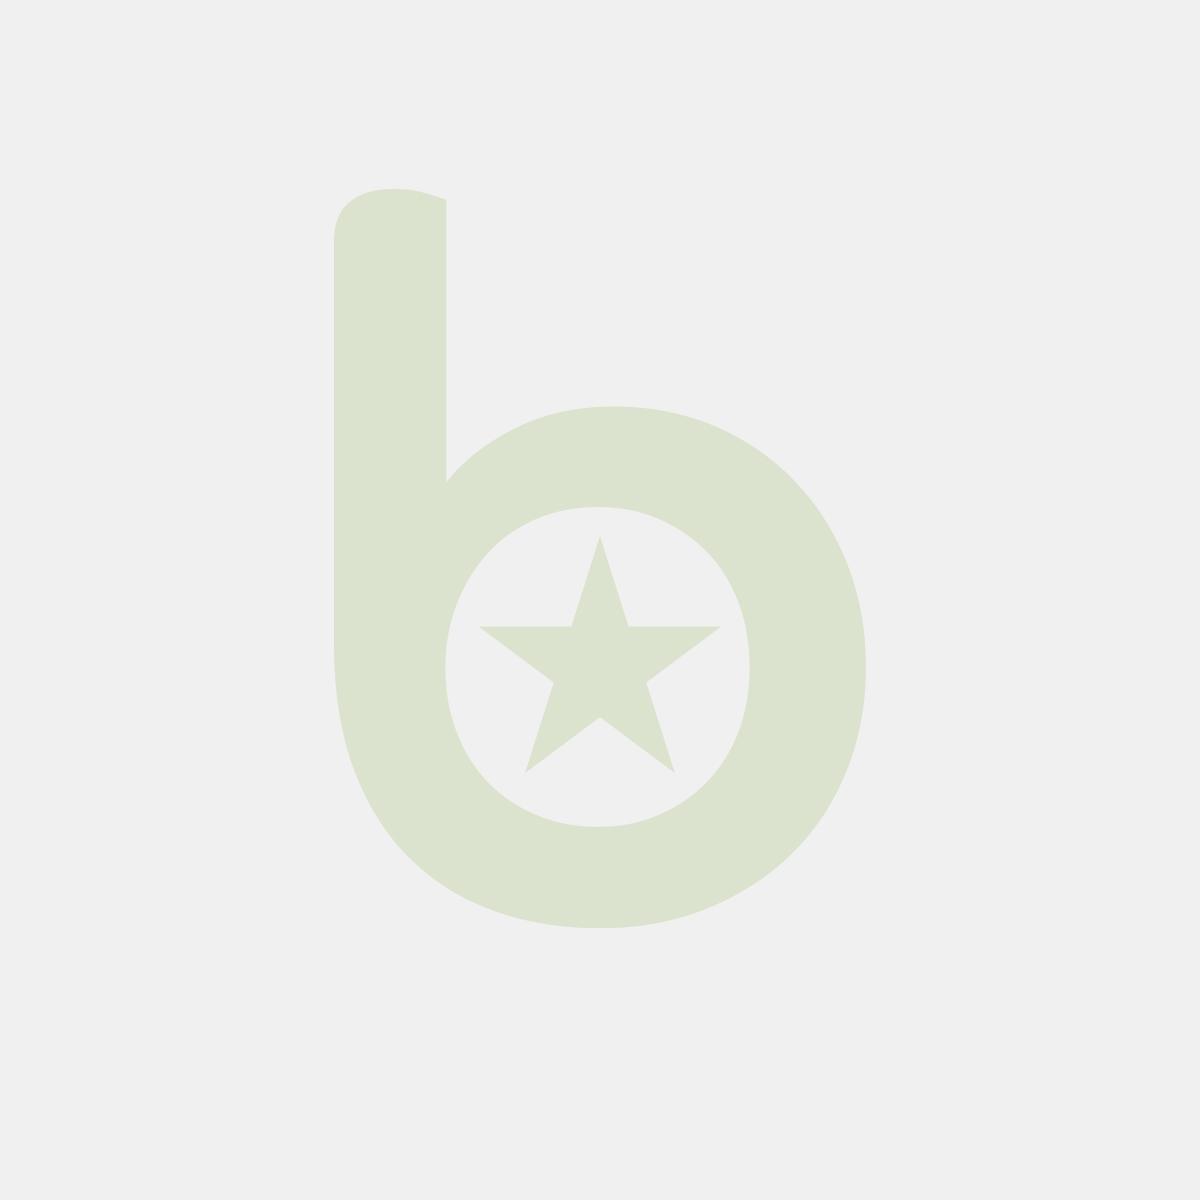 SL 907MBL sosjerka czarna 80ml opakowanie 84szt